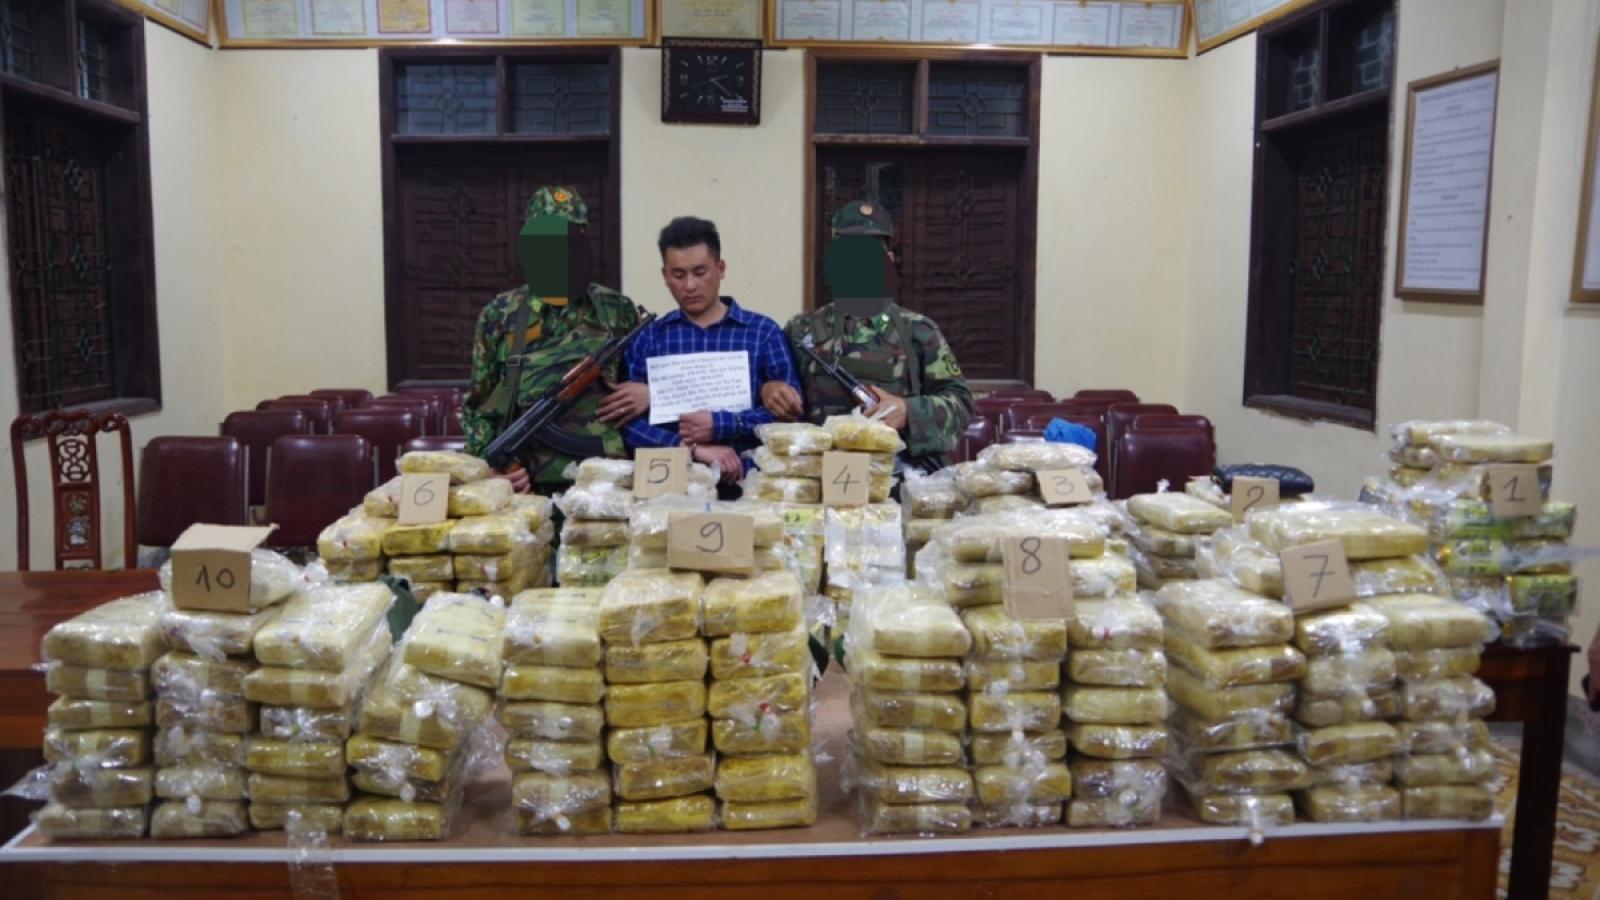 Police seize 350kg of drugs in bust of transnational drug ring